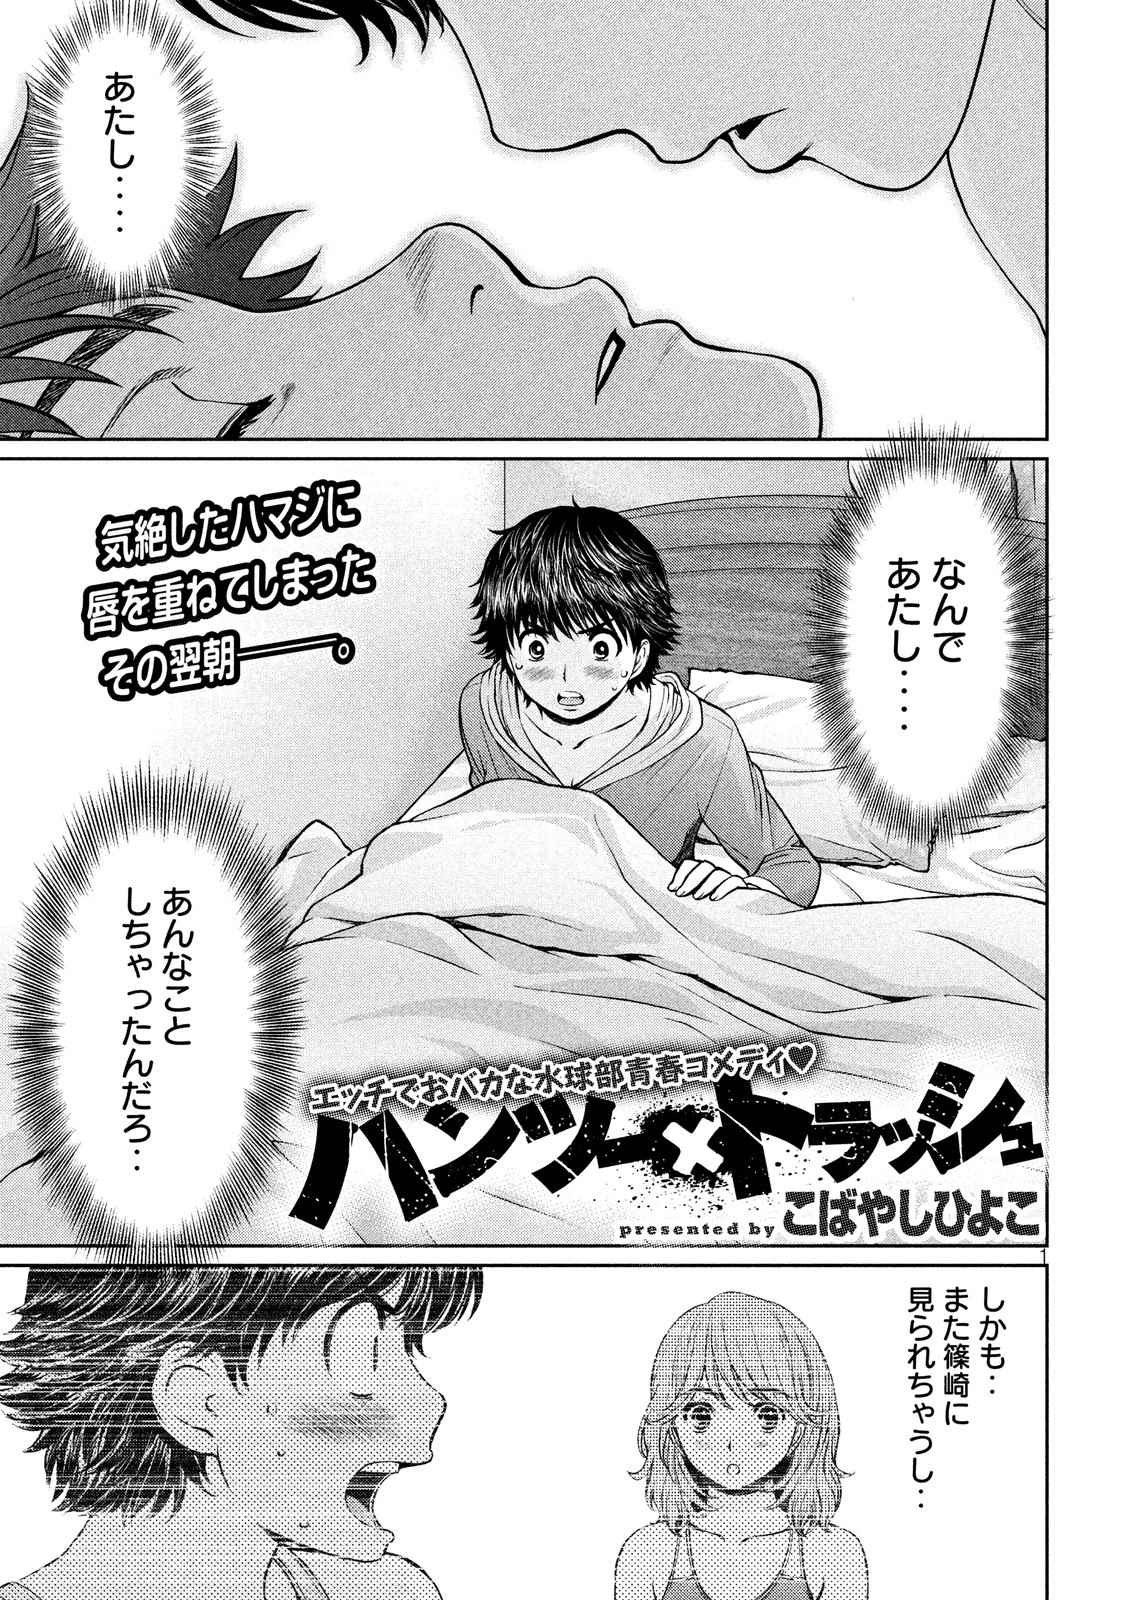 Hantsu_x_Trash Chapter 138 Page 1